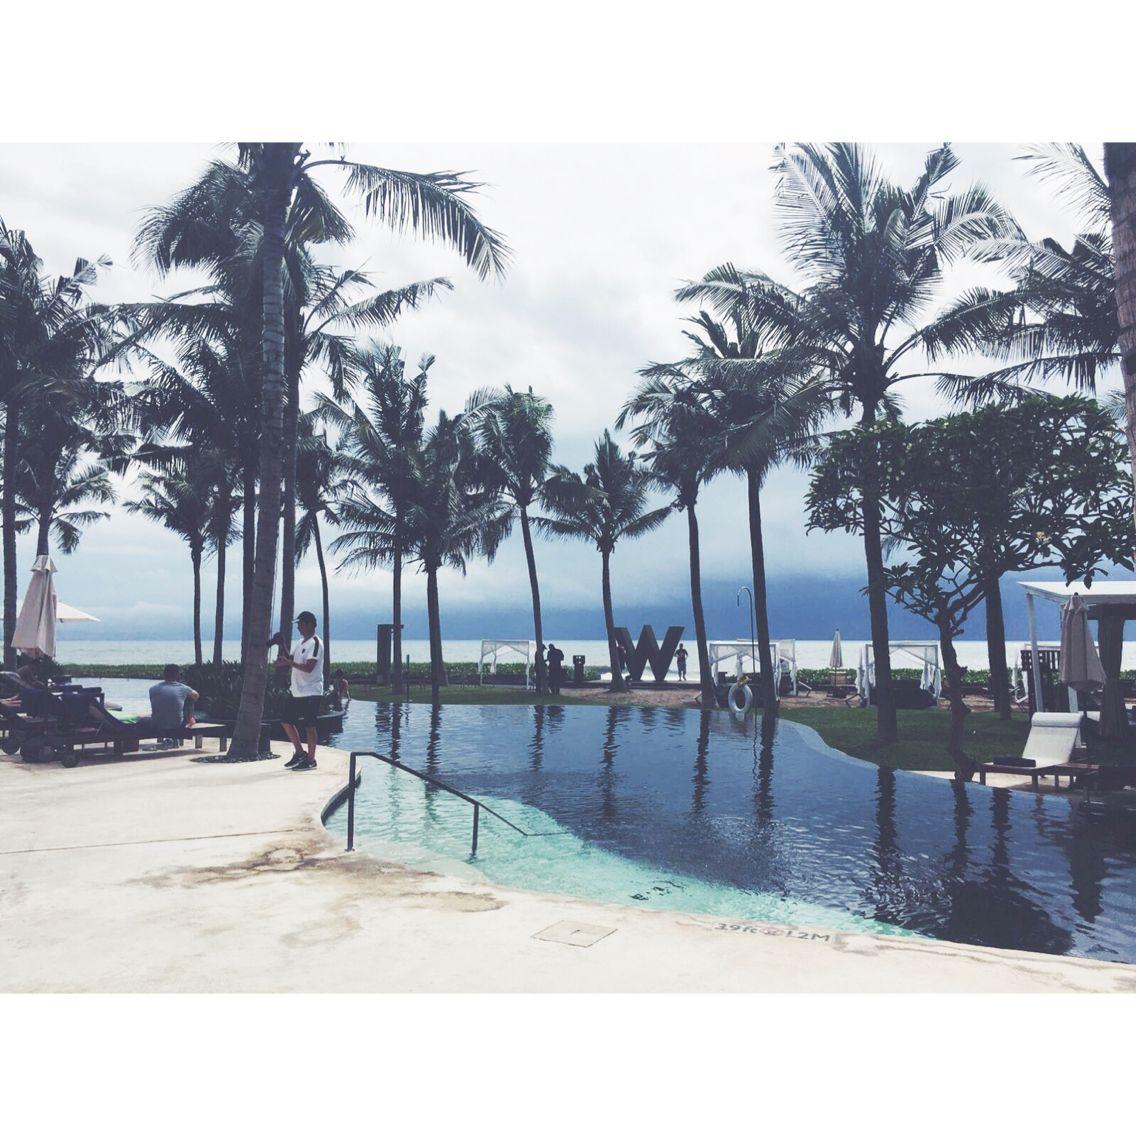 W Hotel, Bar, Spa #Wtreatment #bali #spa #hotel #paradise